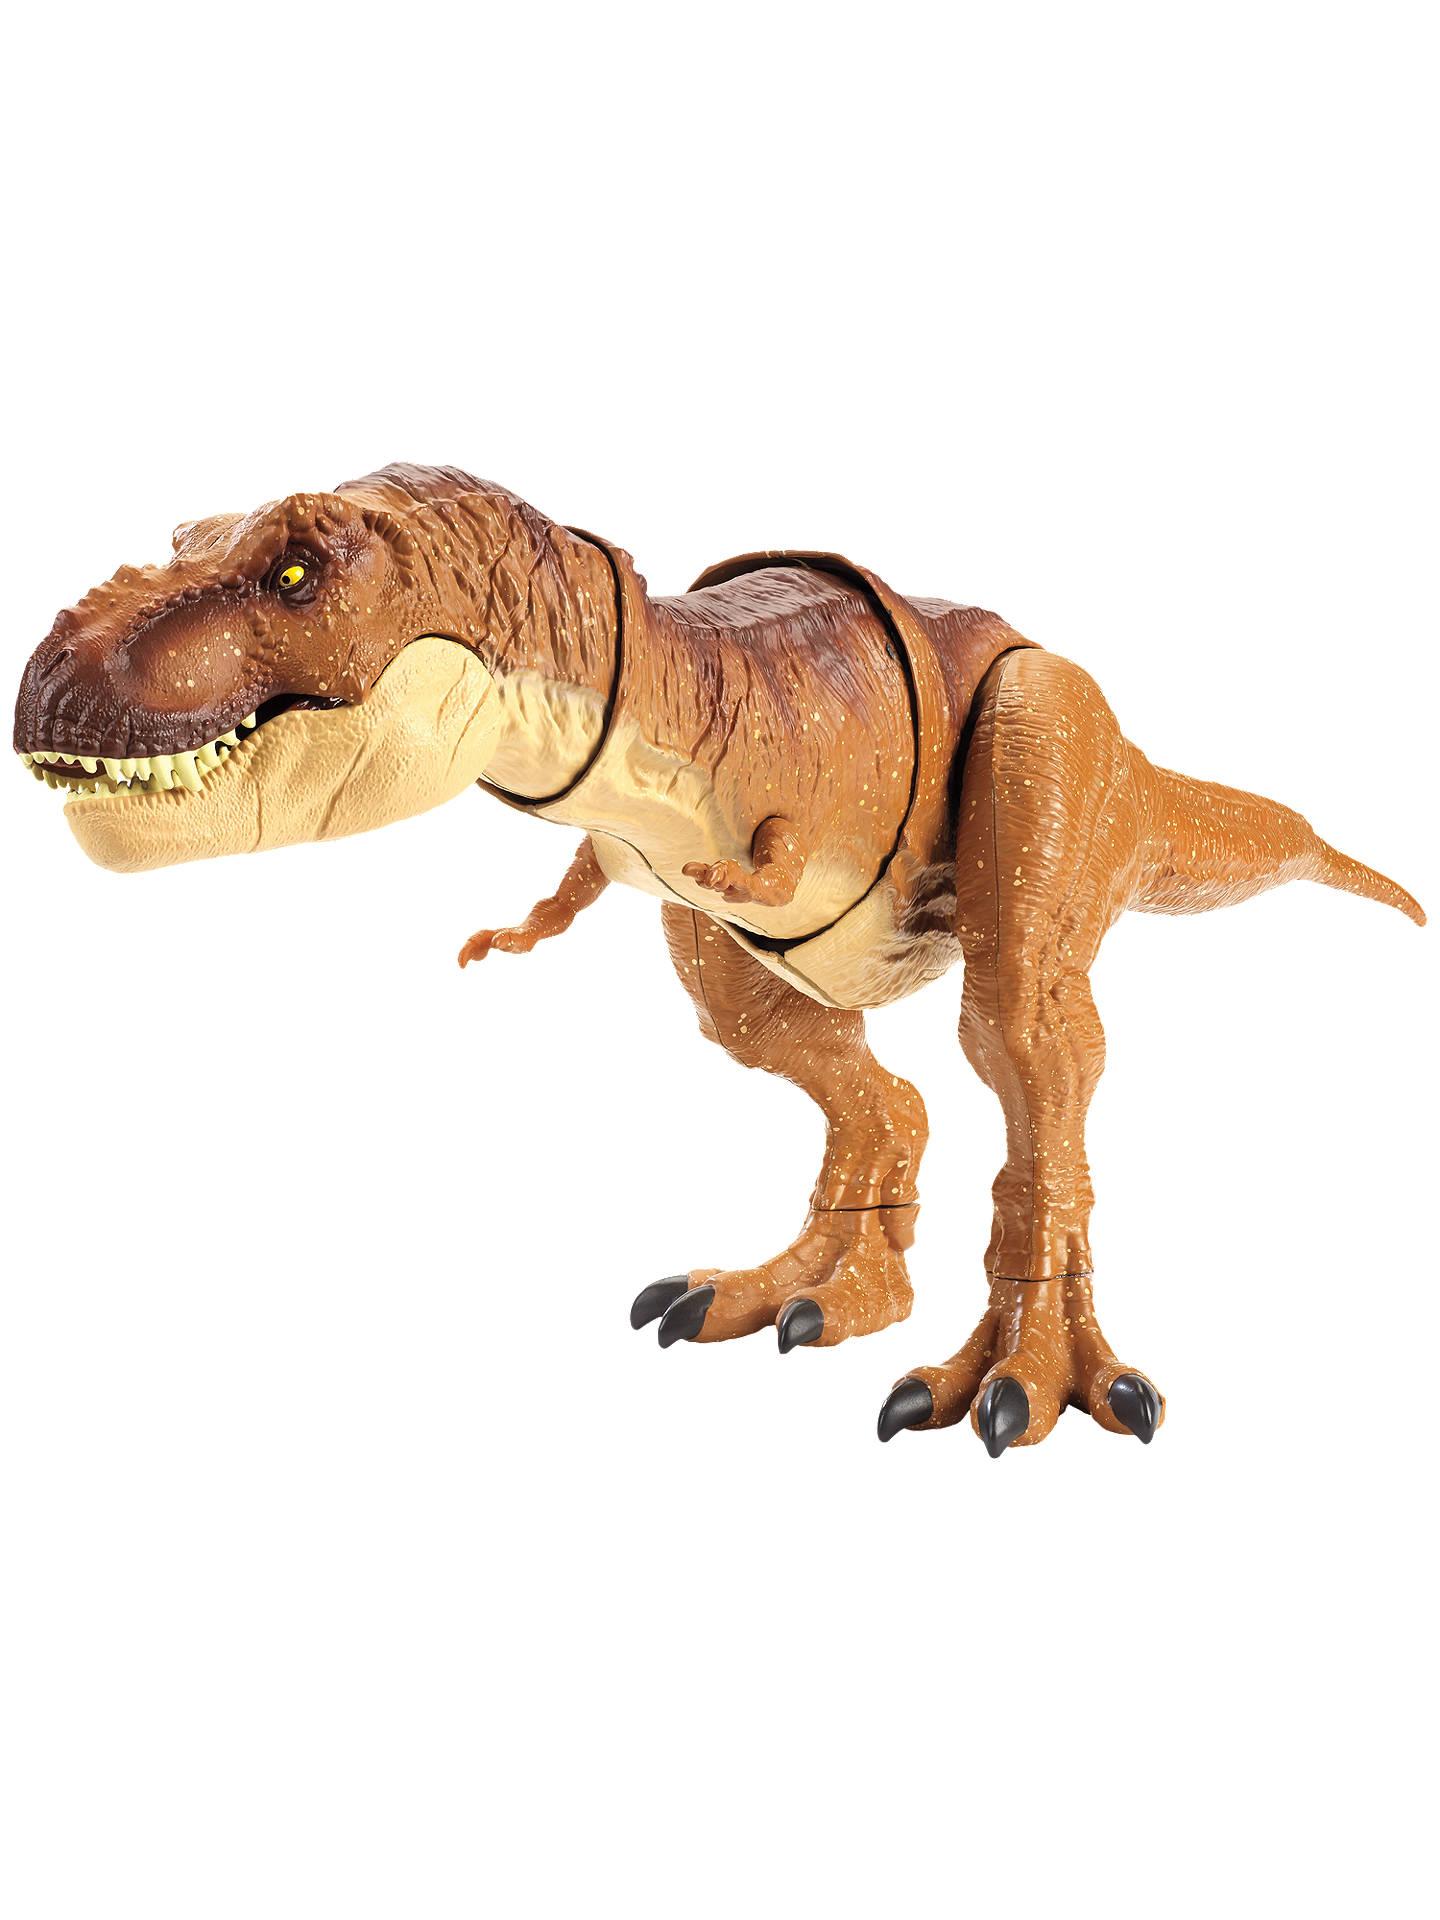 425b16ae9848 Buy Jurassic World Thrash N Throw T-Rex Online at johnlewis.com ...